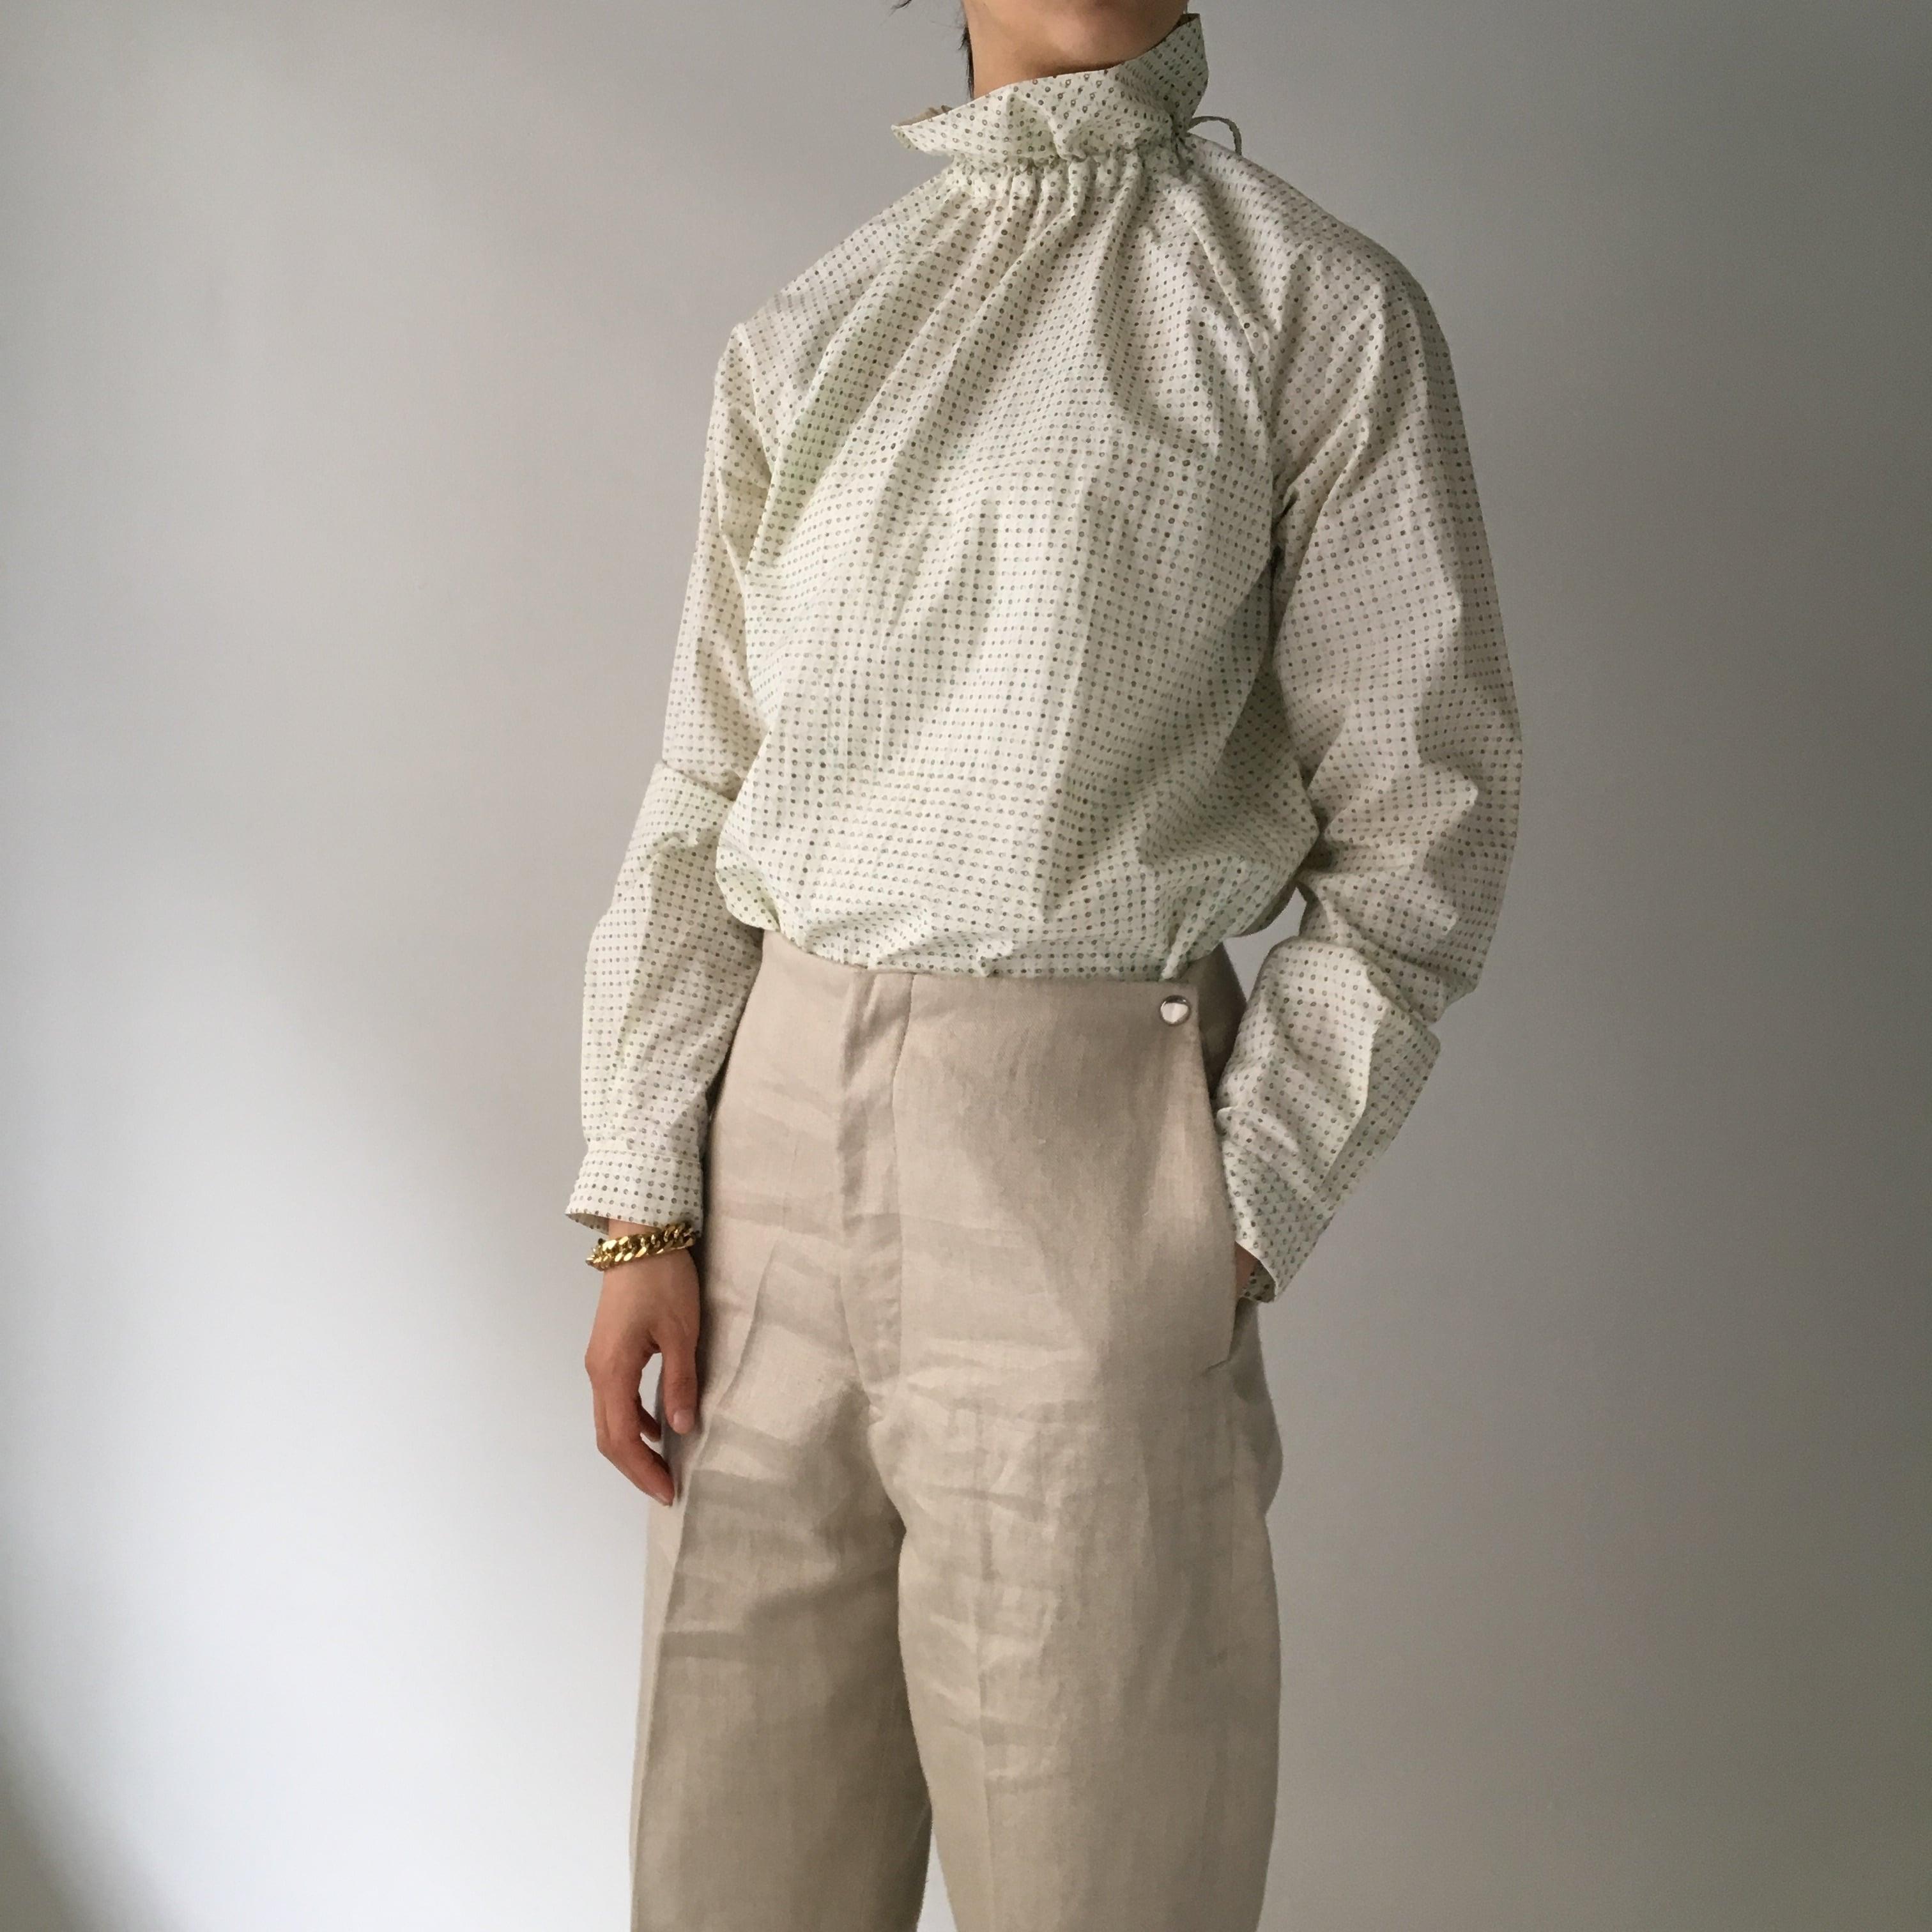 "High neck gather blouse ""Block print geometric"" organic cotton"